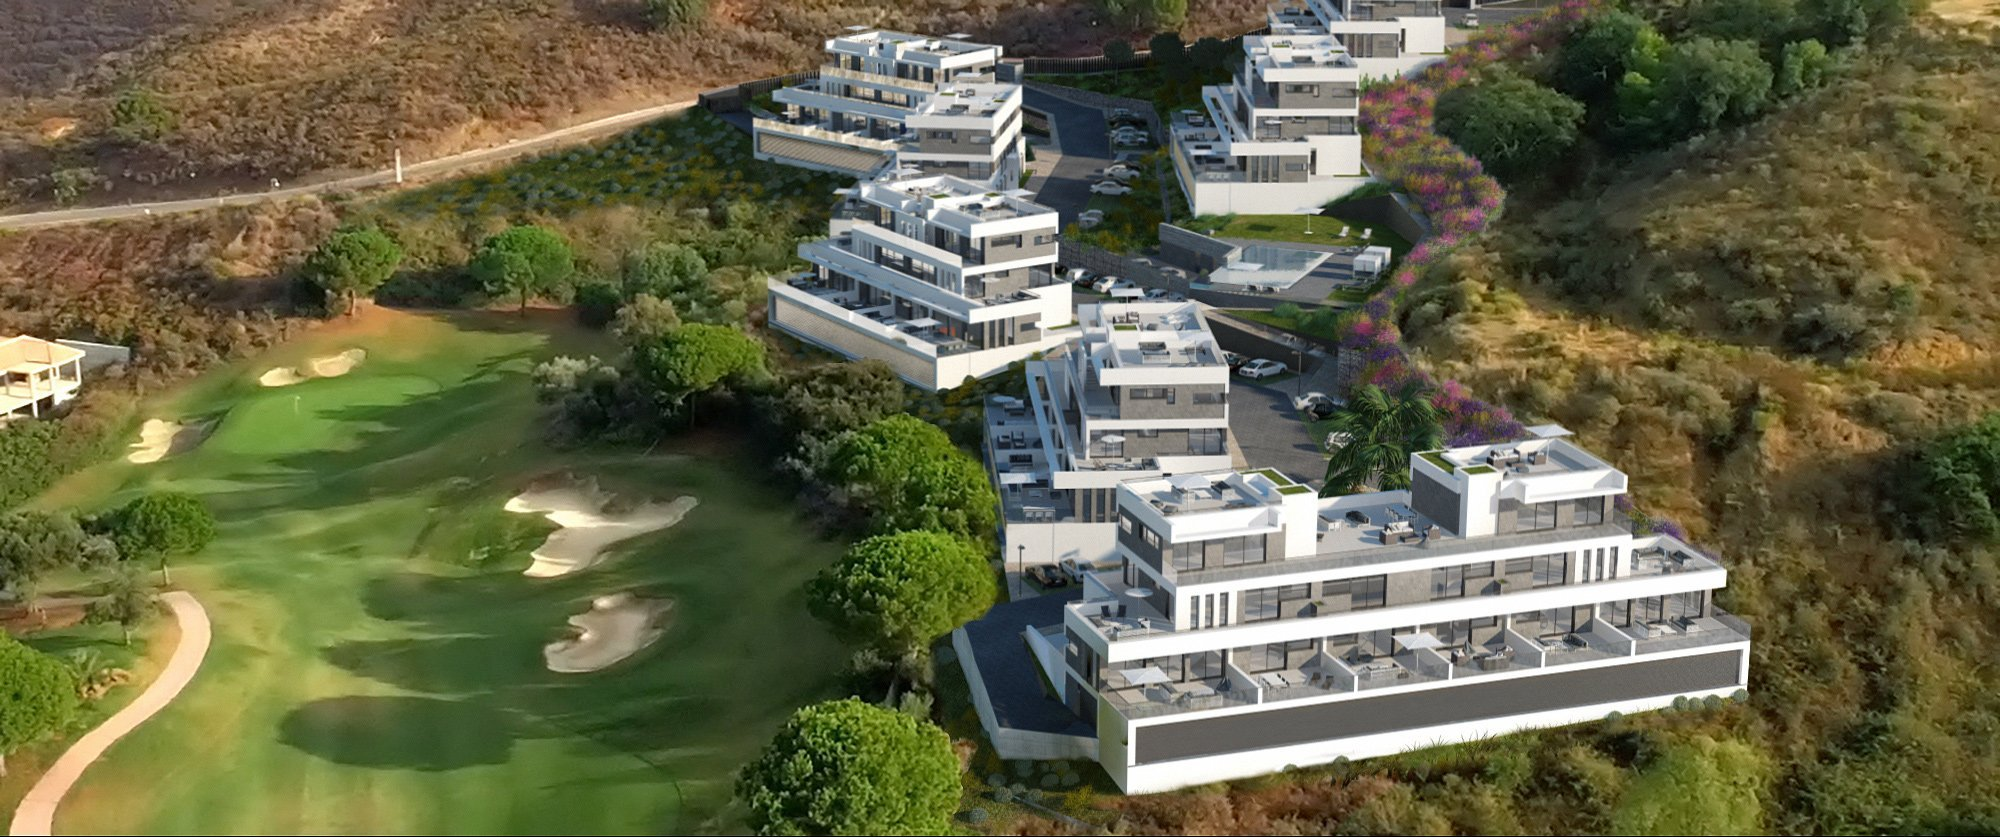 Render exterior aerial condominium by GAYARRE infografia